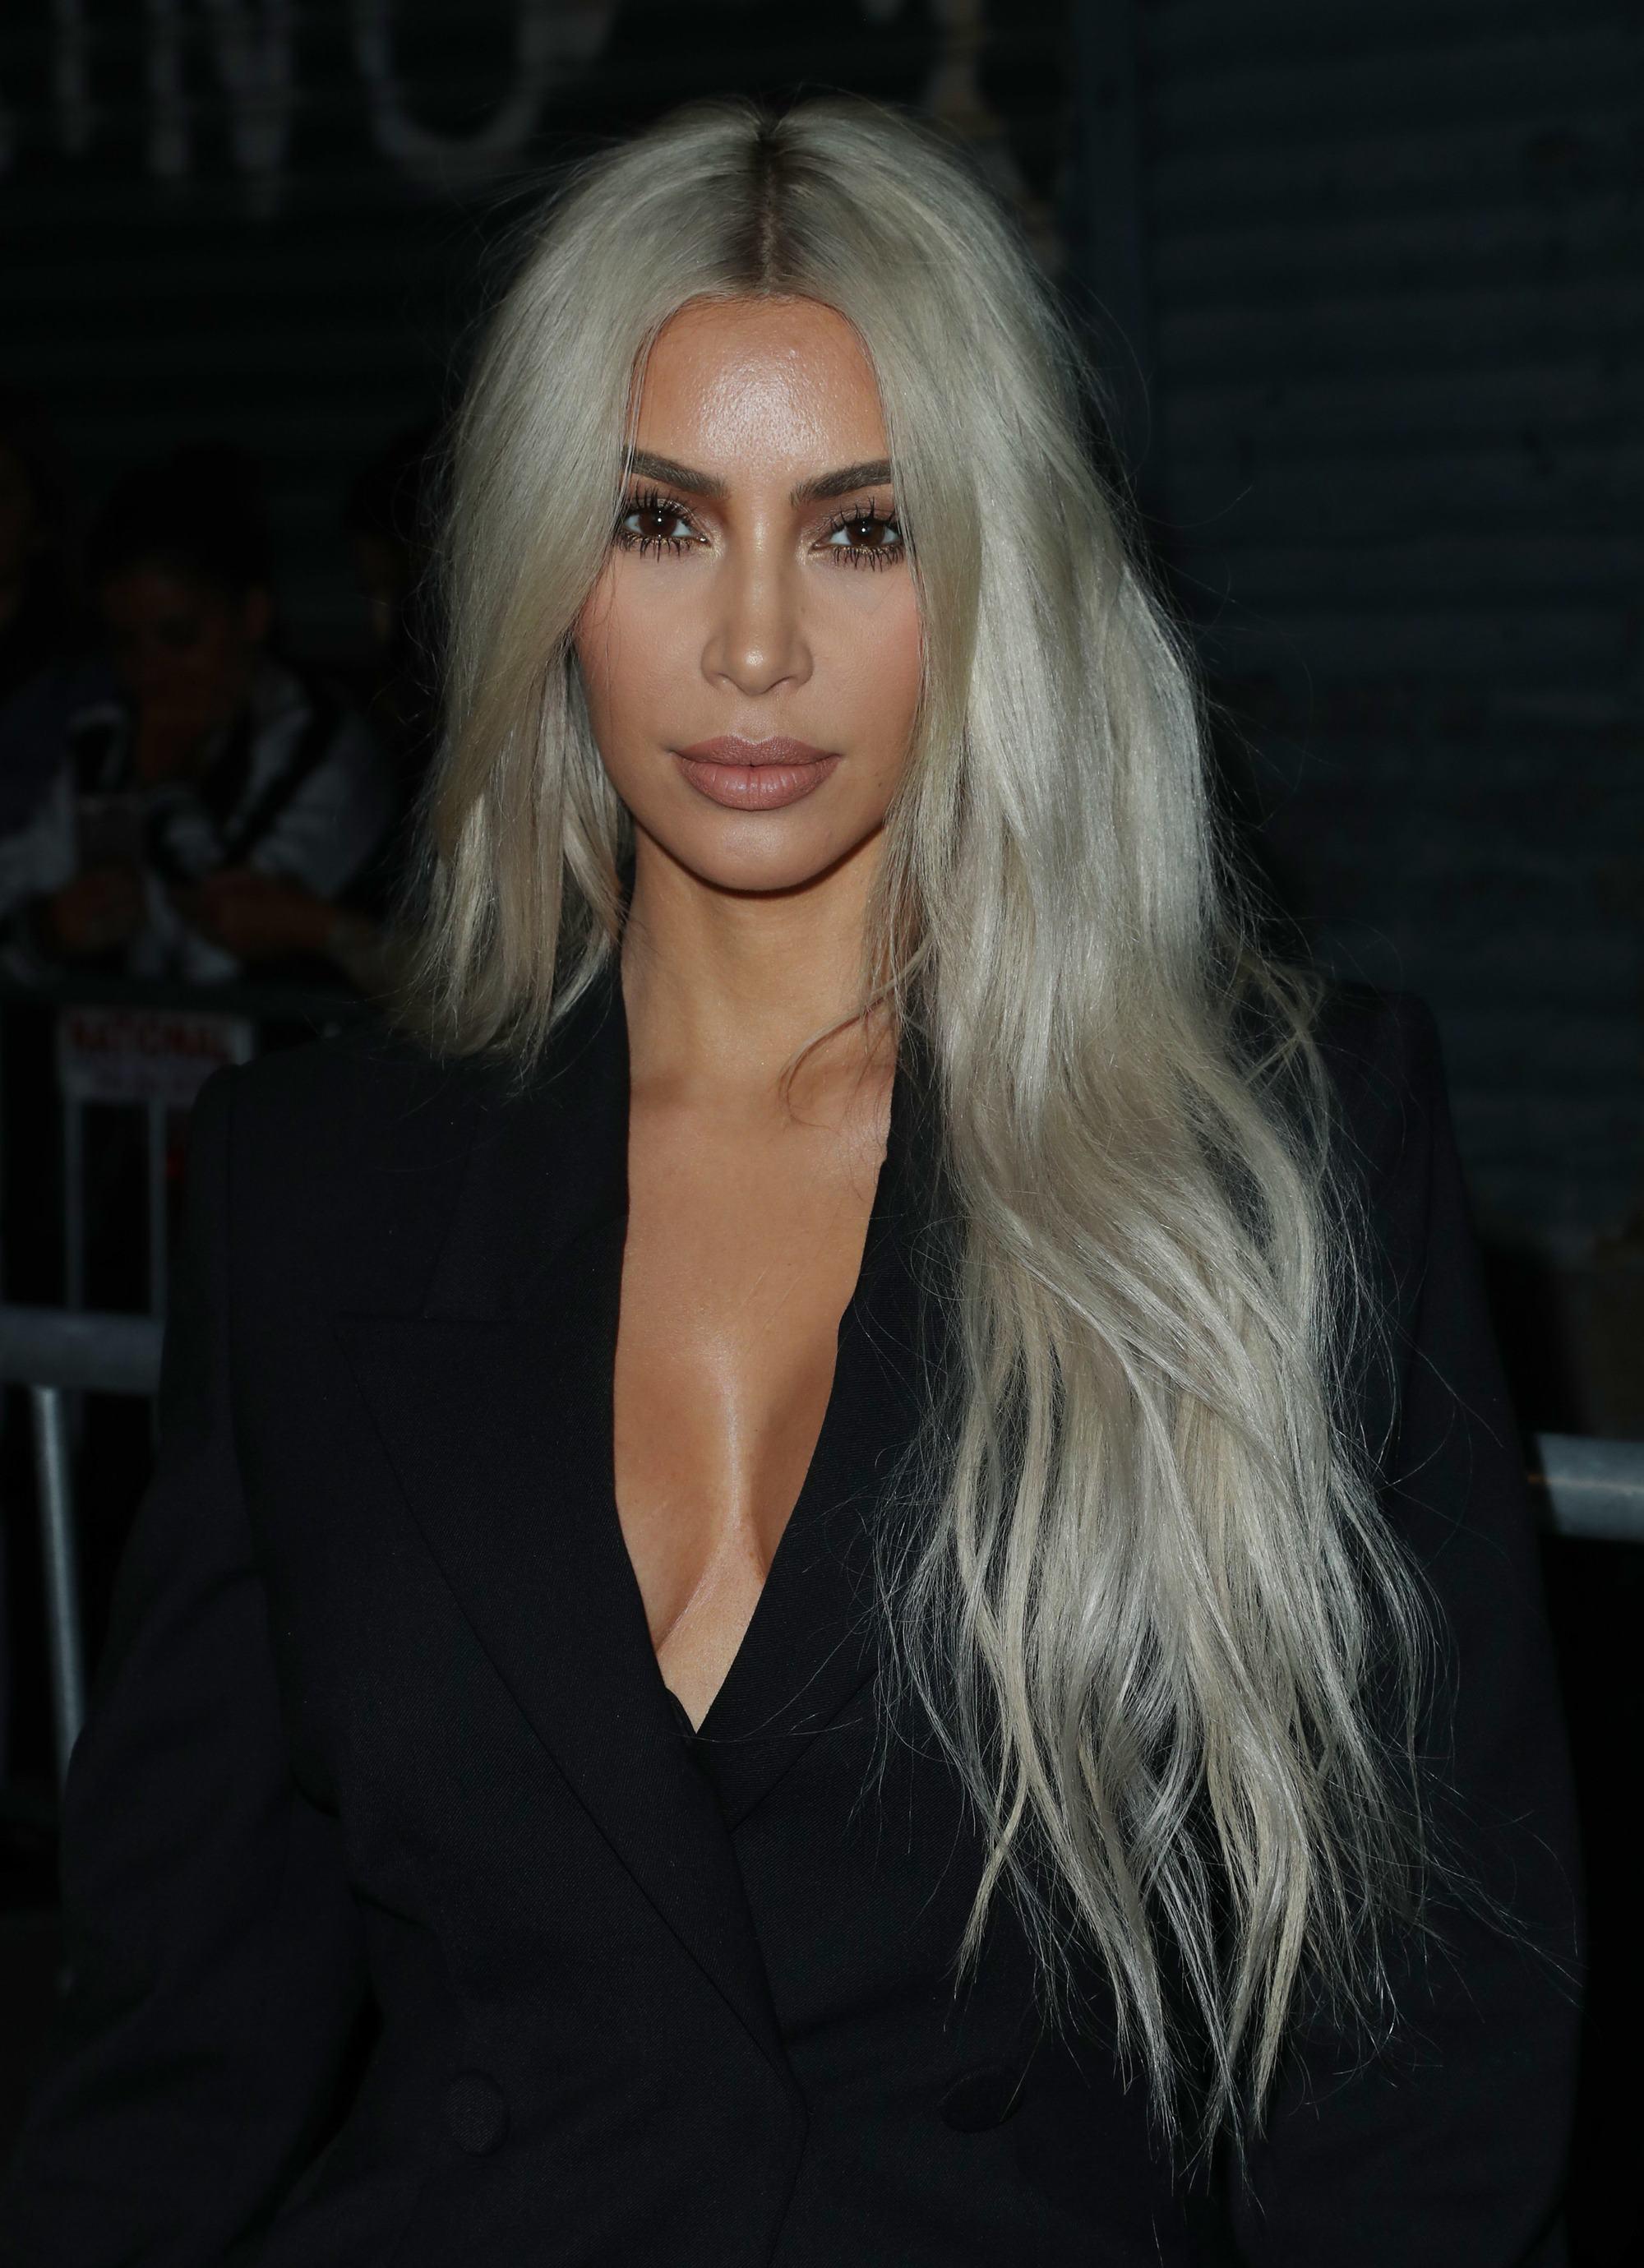 Kim Kardashian rapunzel length silver blonde hair with tousled waves over one shoulder